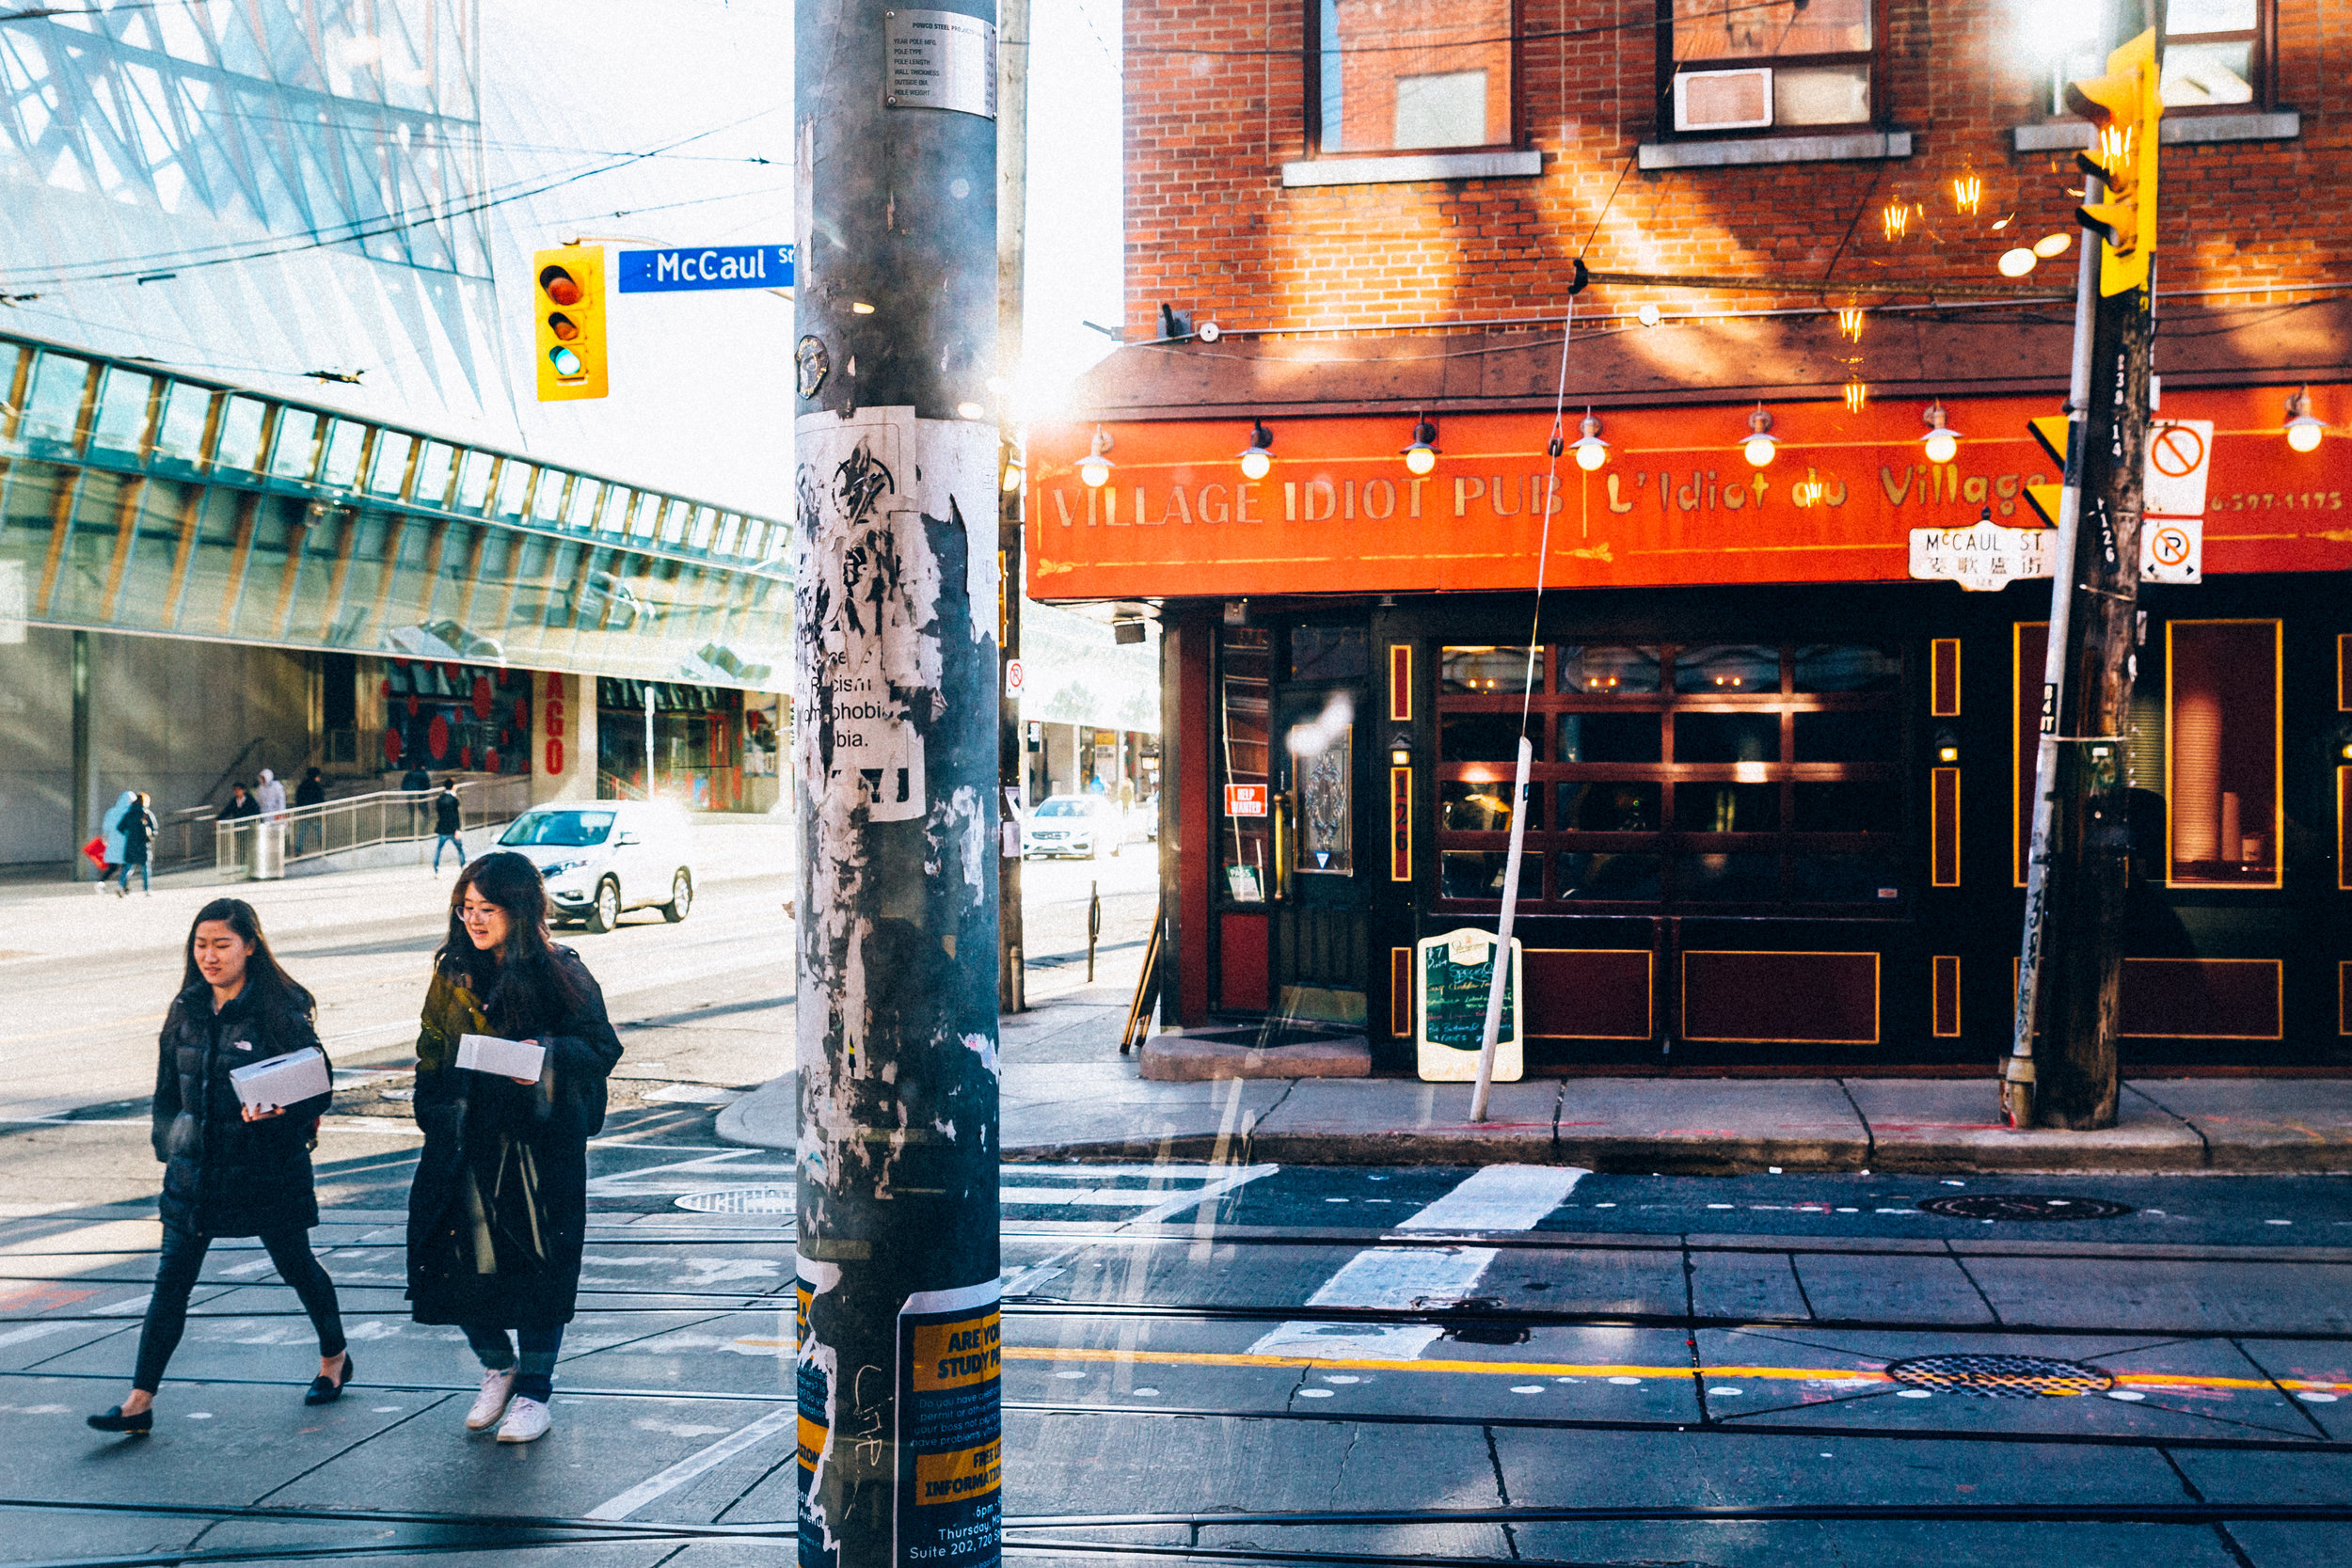 Tourism in Toronto